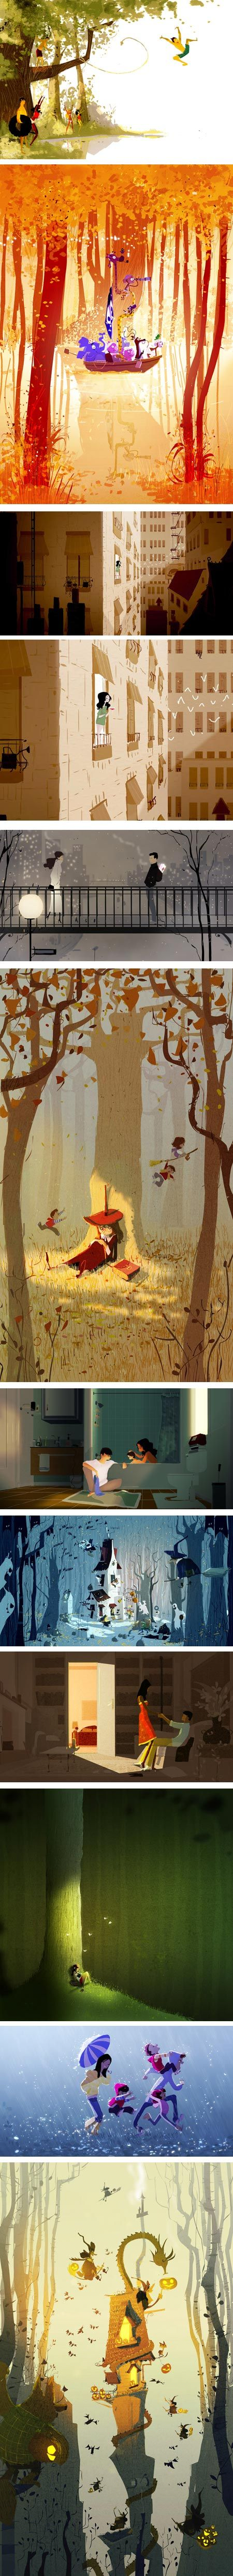 "Pascal Campion - ""Illustration compilation (via linesandcolors)"""